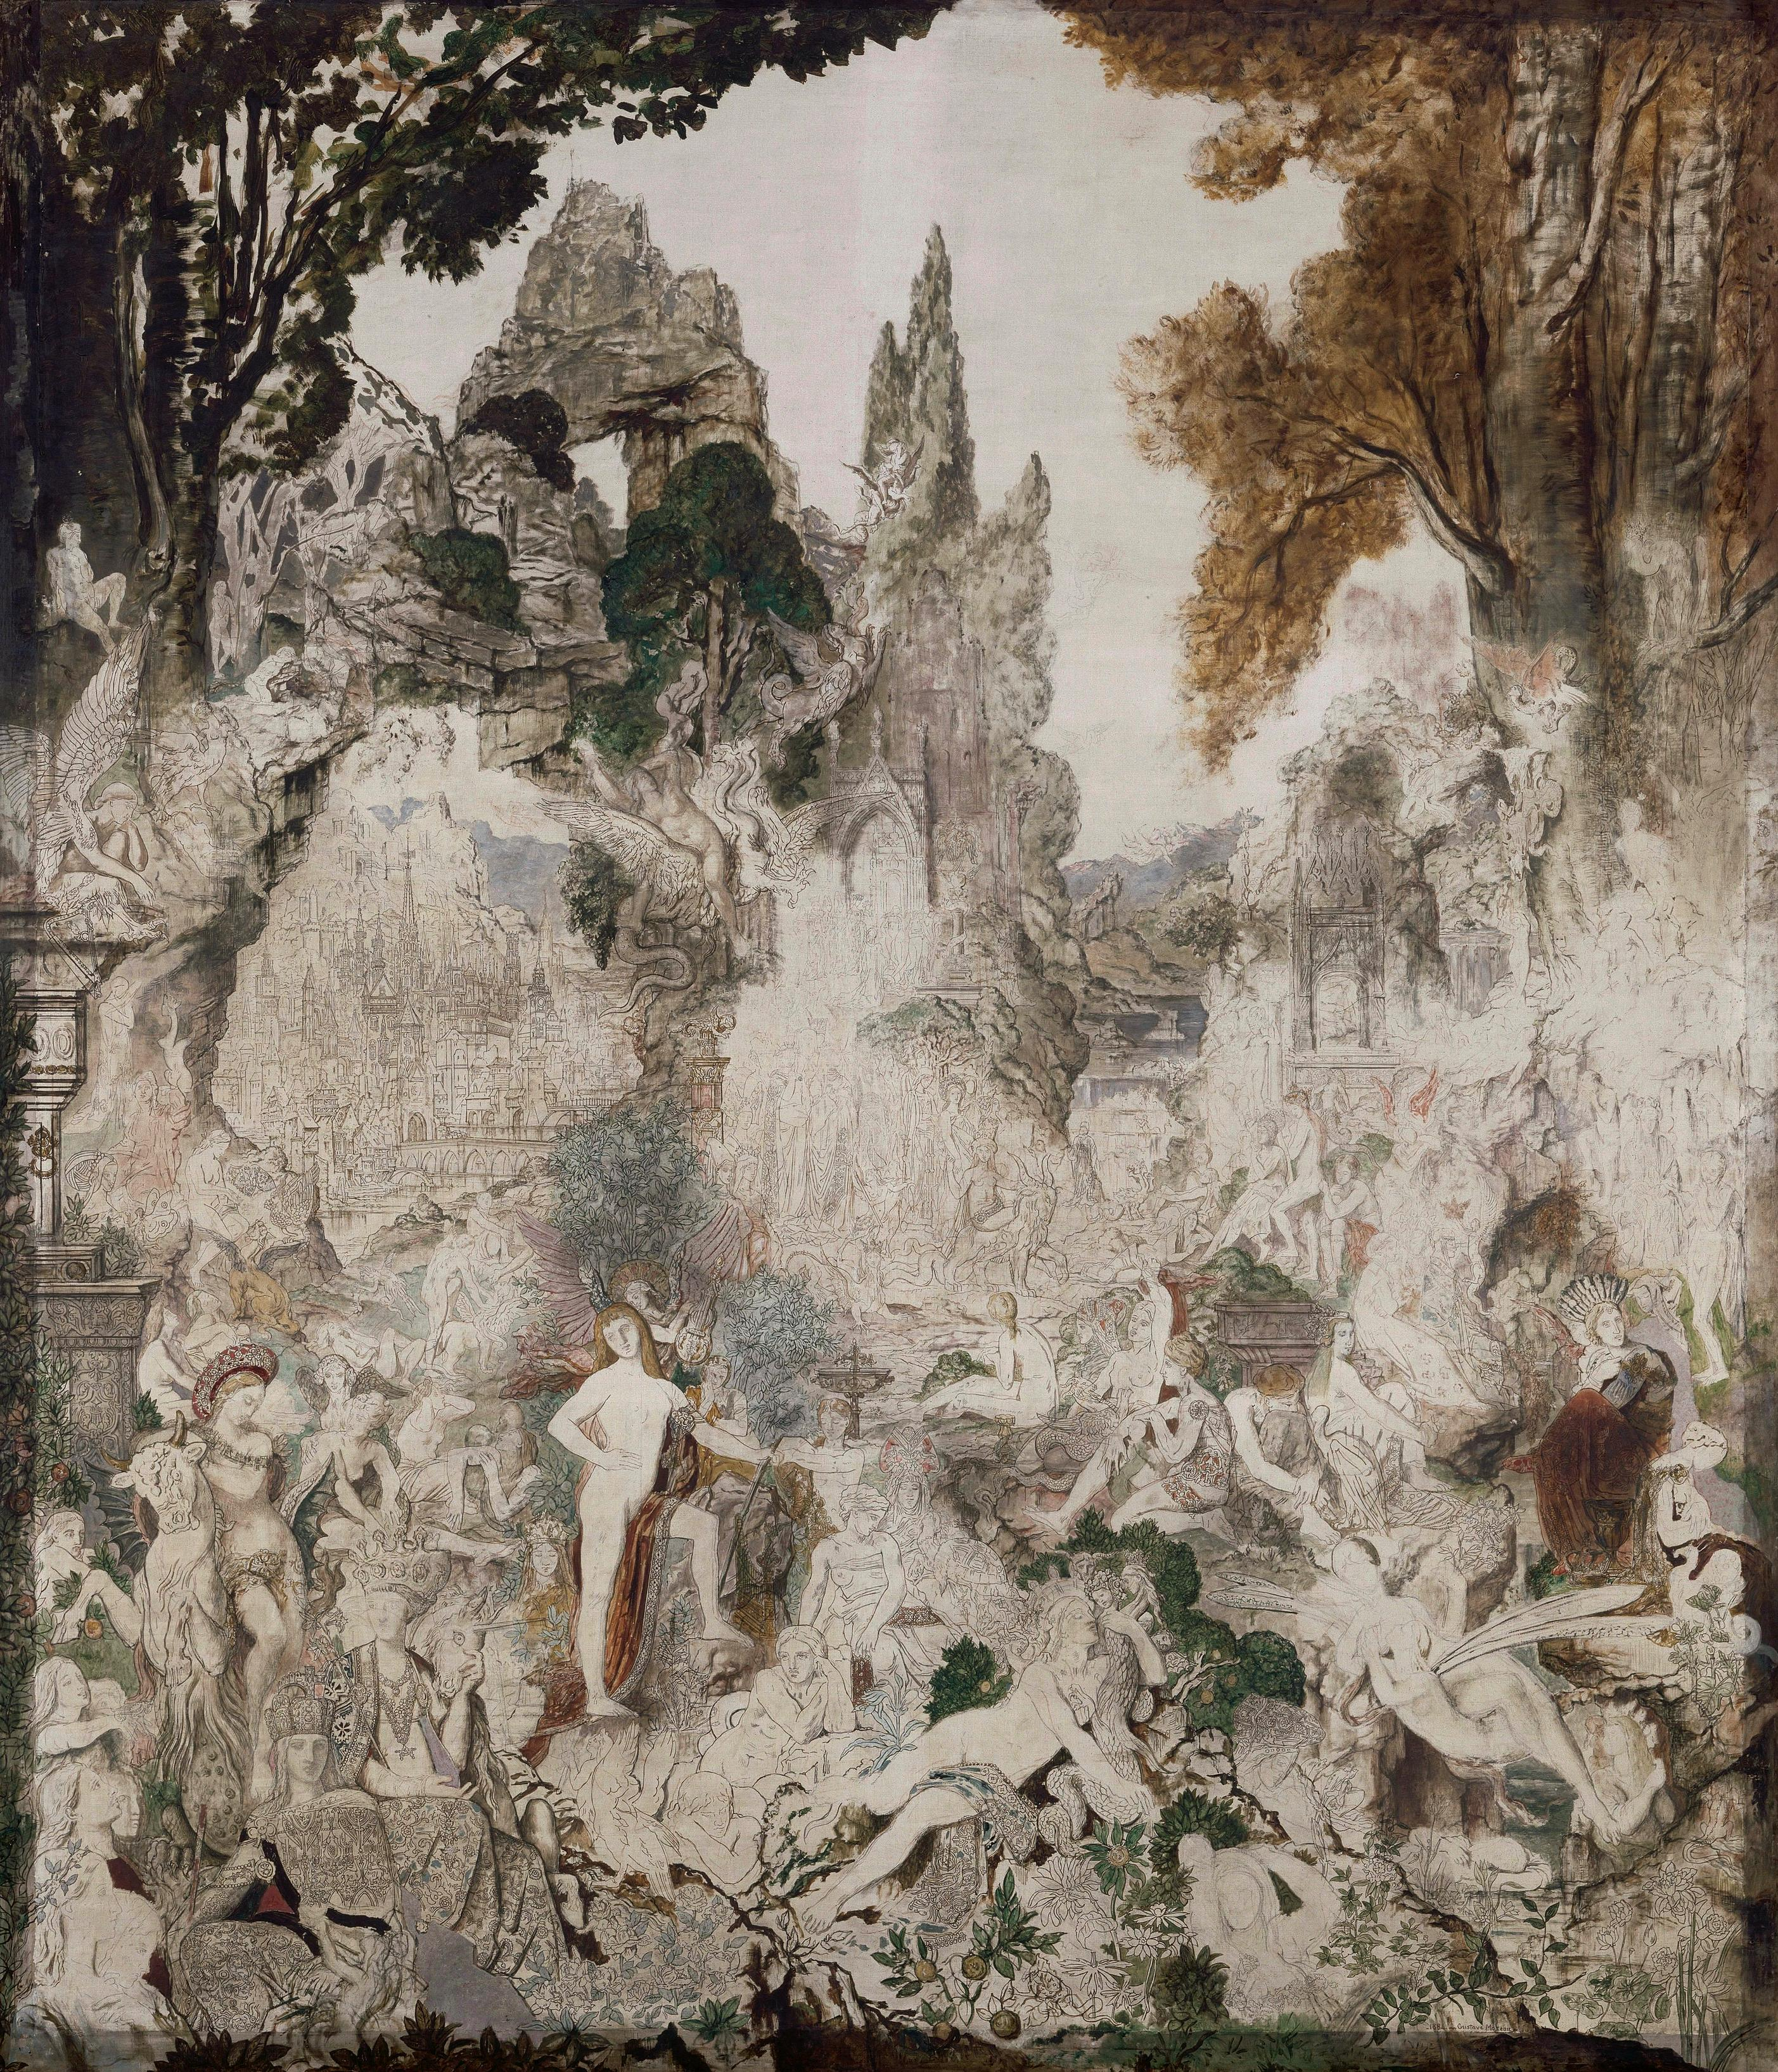 1884_Химеры (236 х 204 см) (Париж, музей Гюстава Моро)